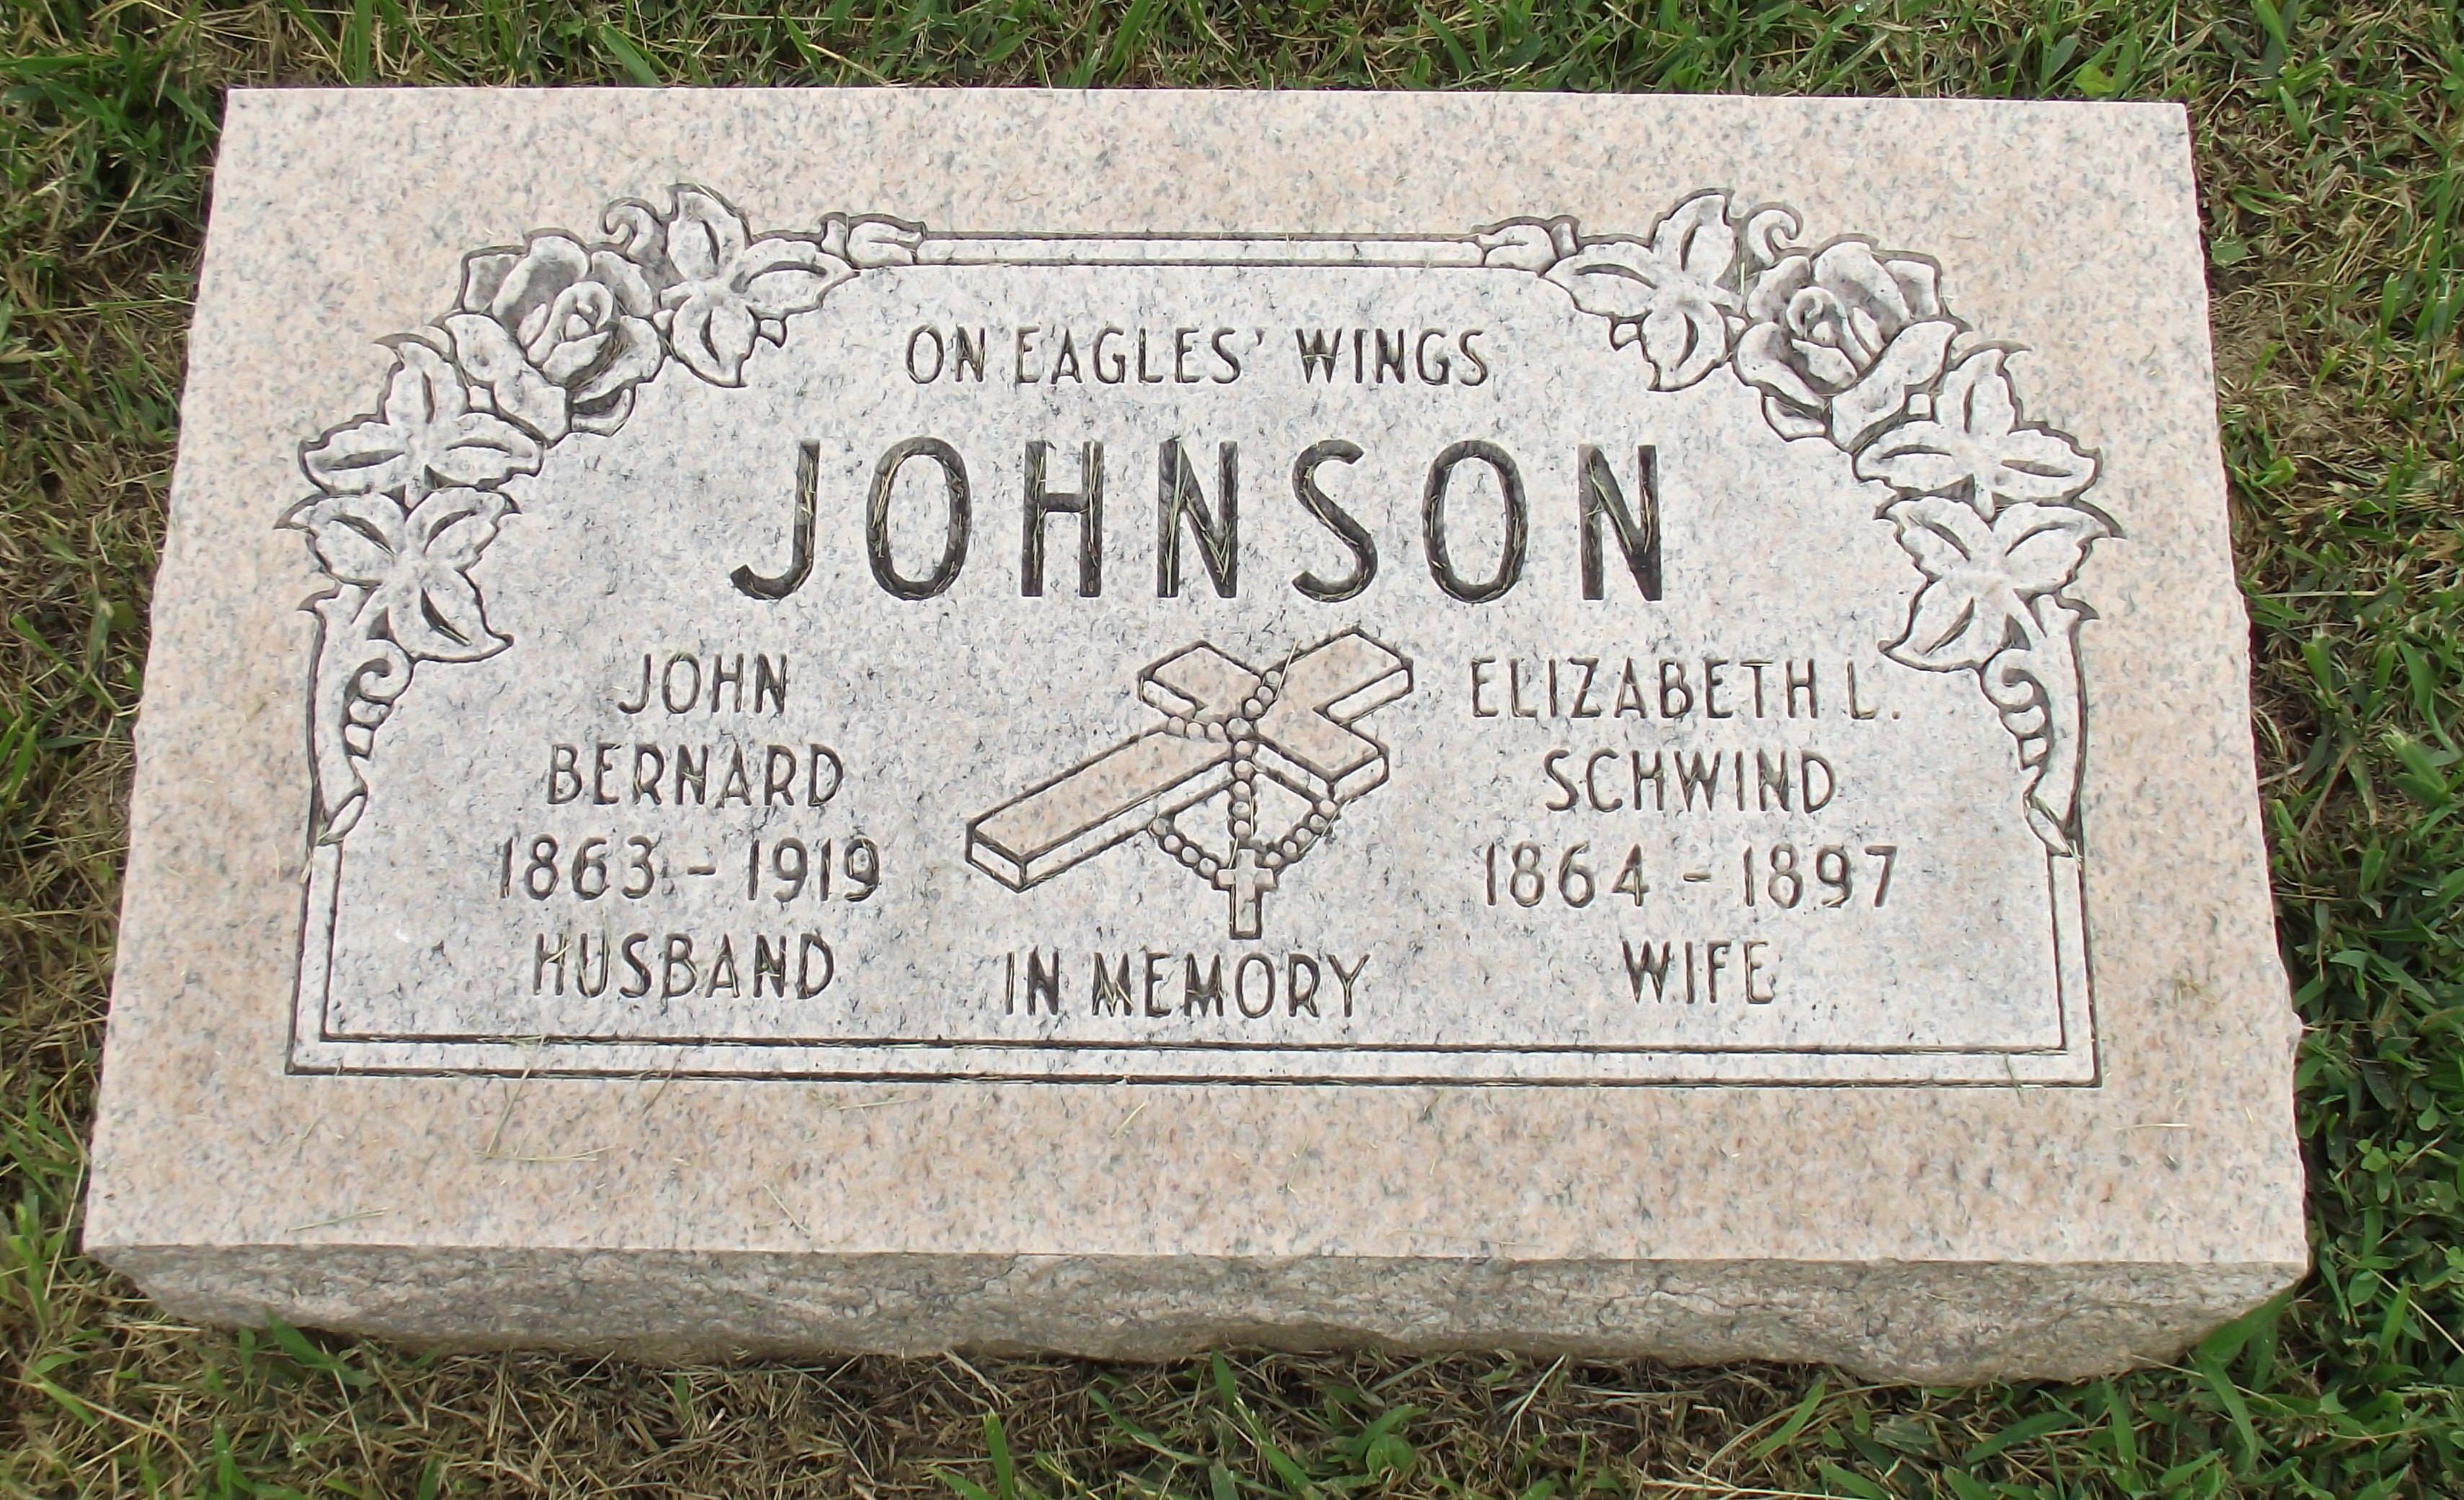 John Bernard Johnson